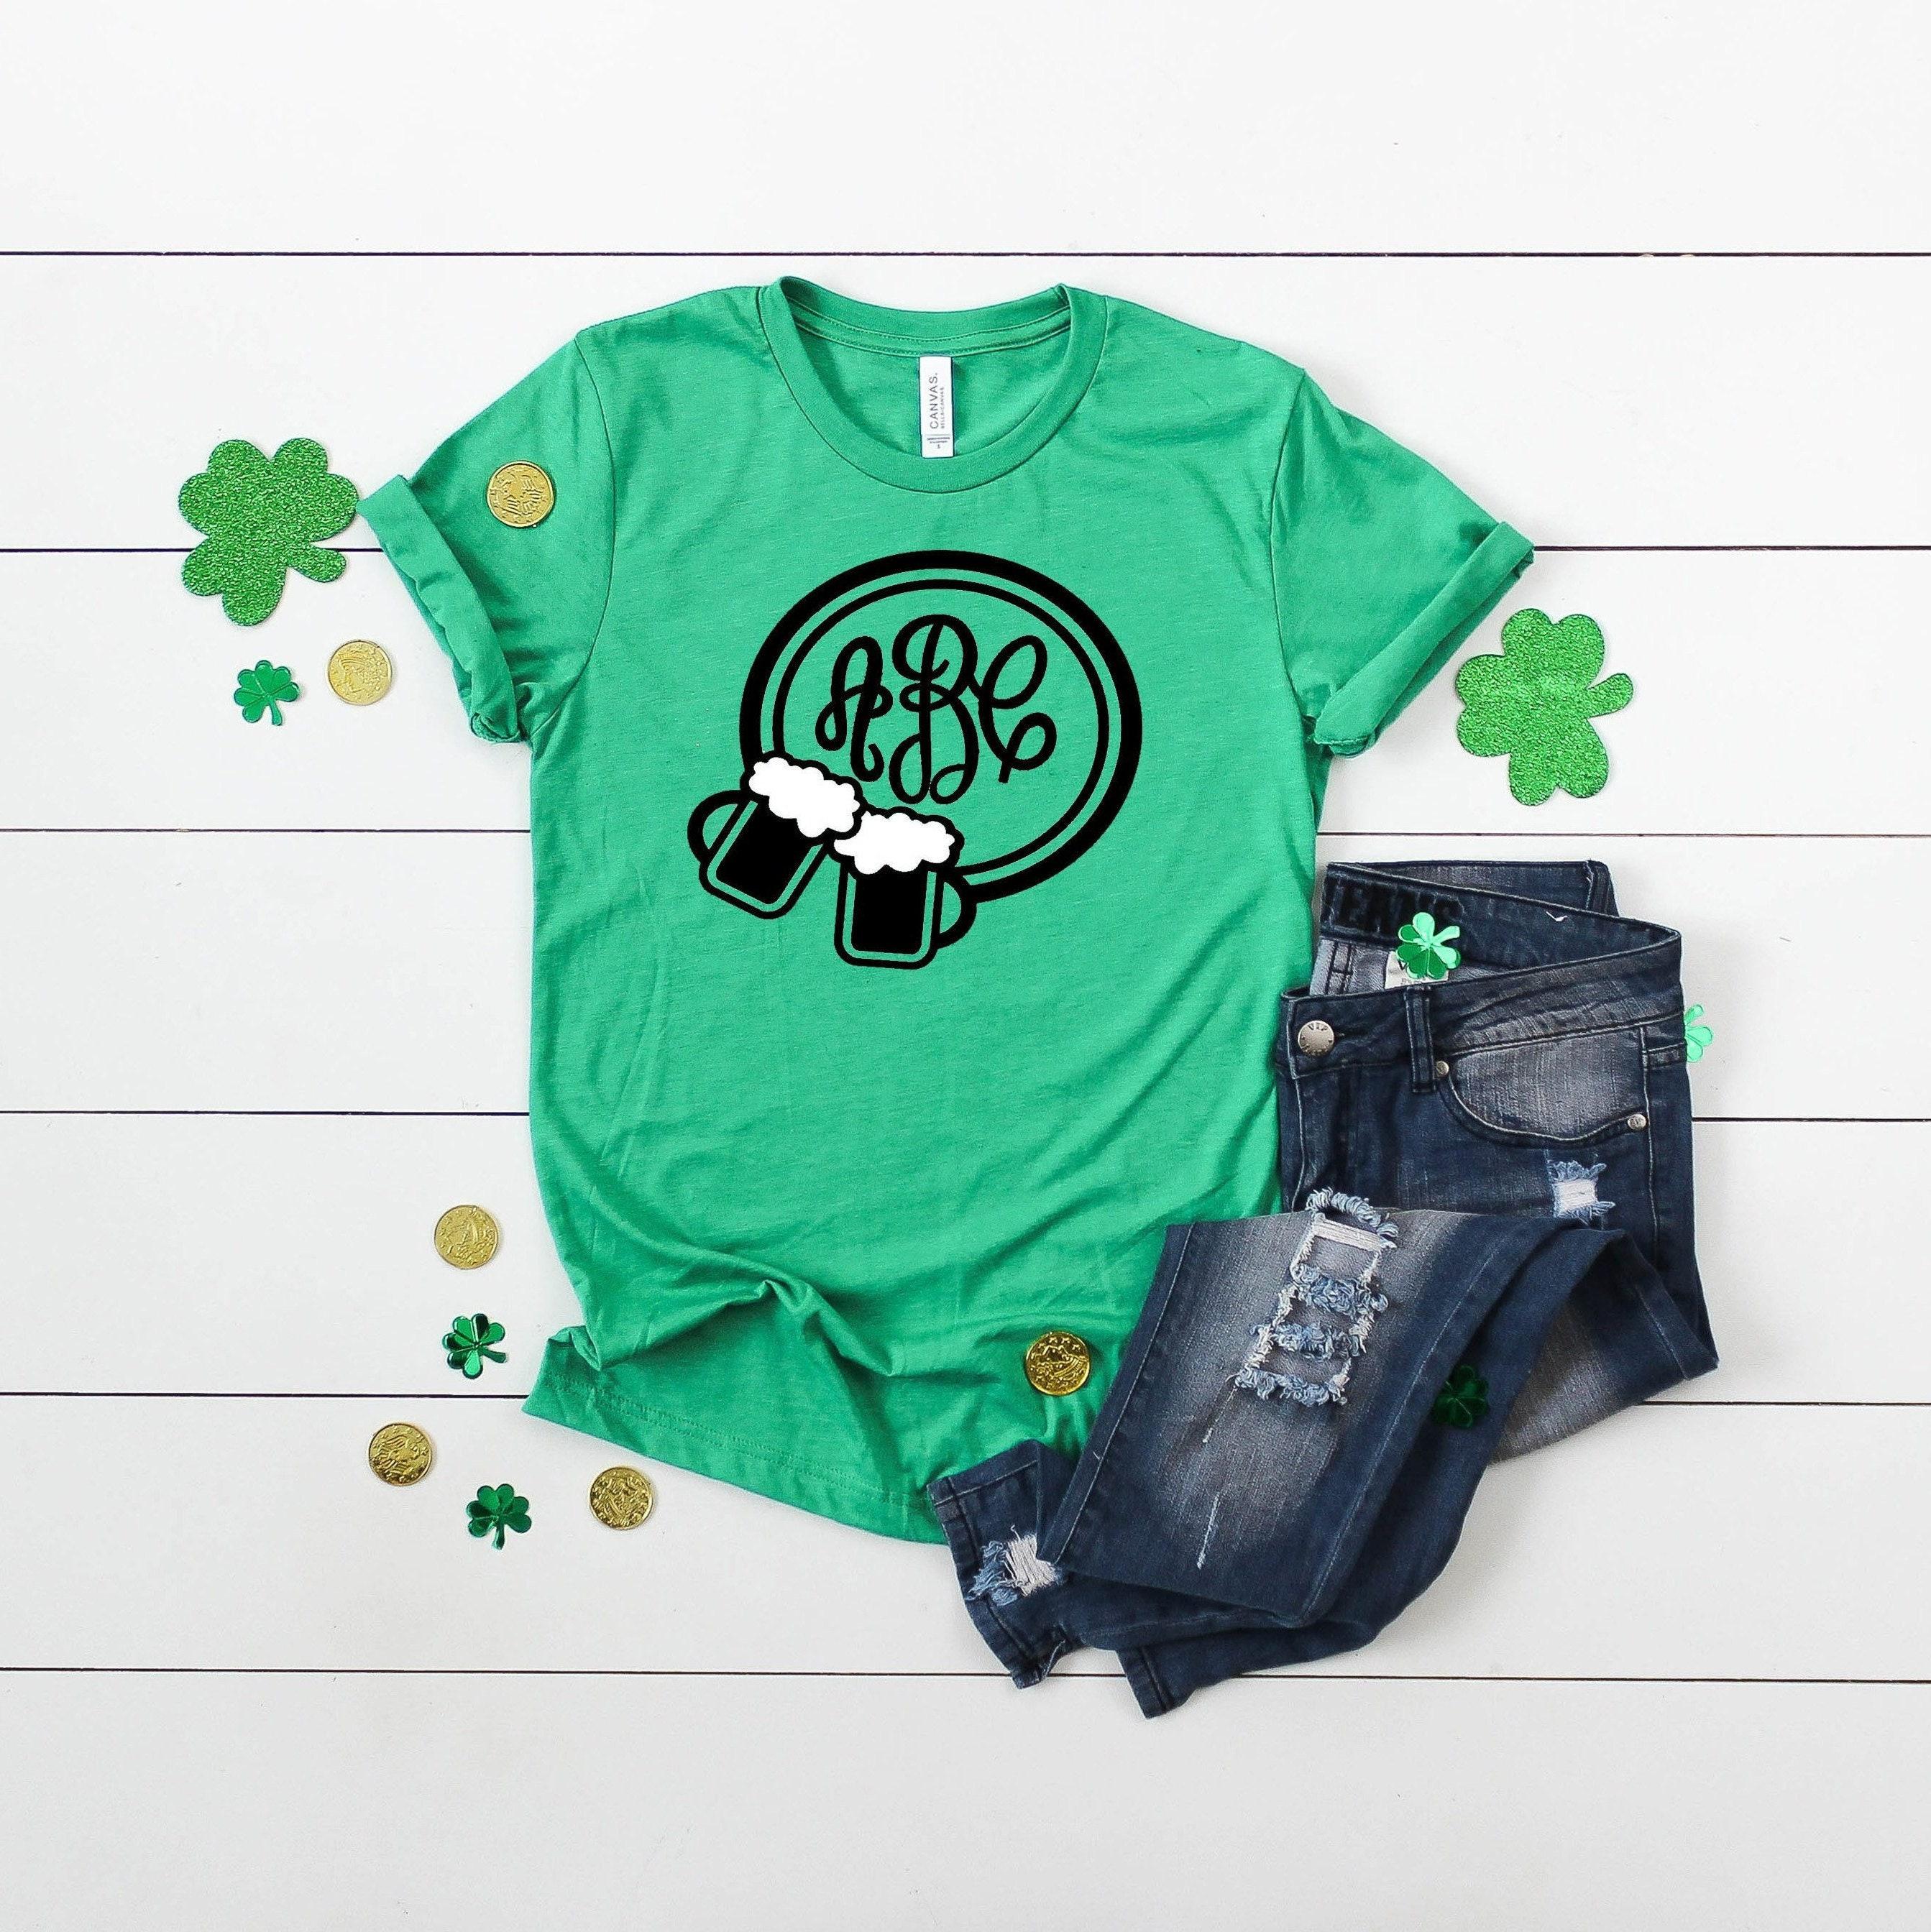 Monogram Cheers Beers St  Patrick's Day Short Sleeved Shirt